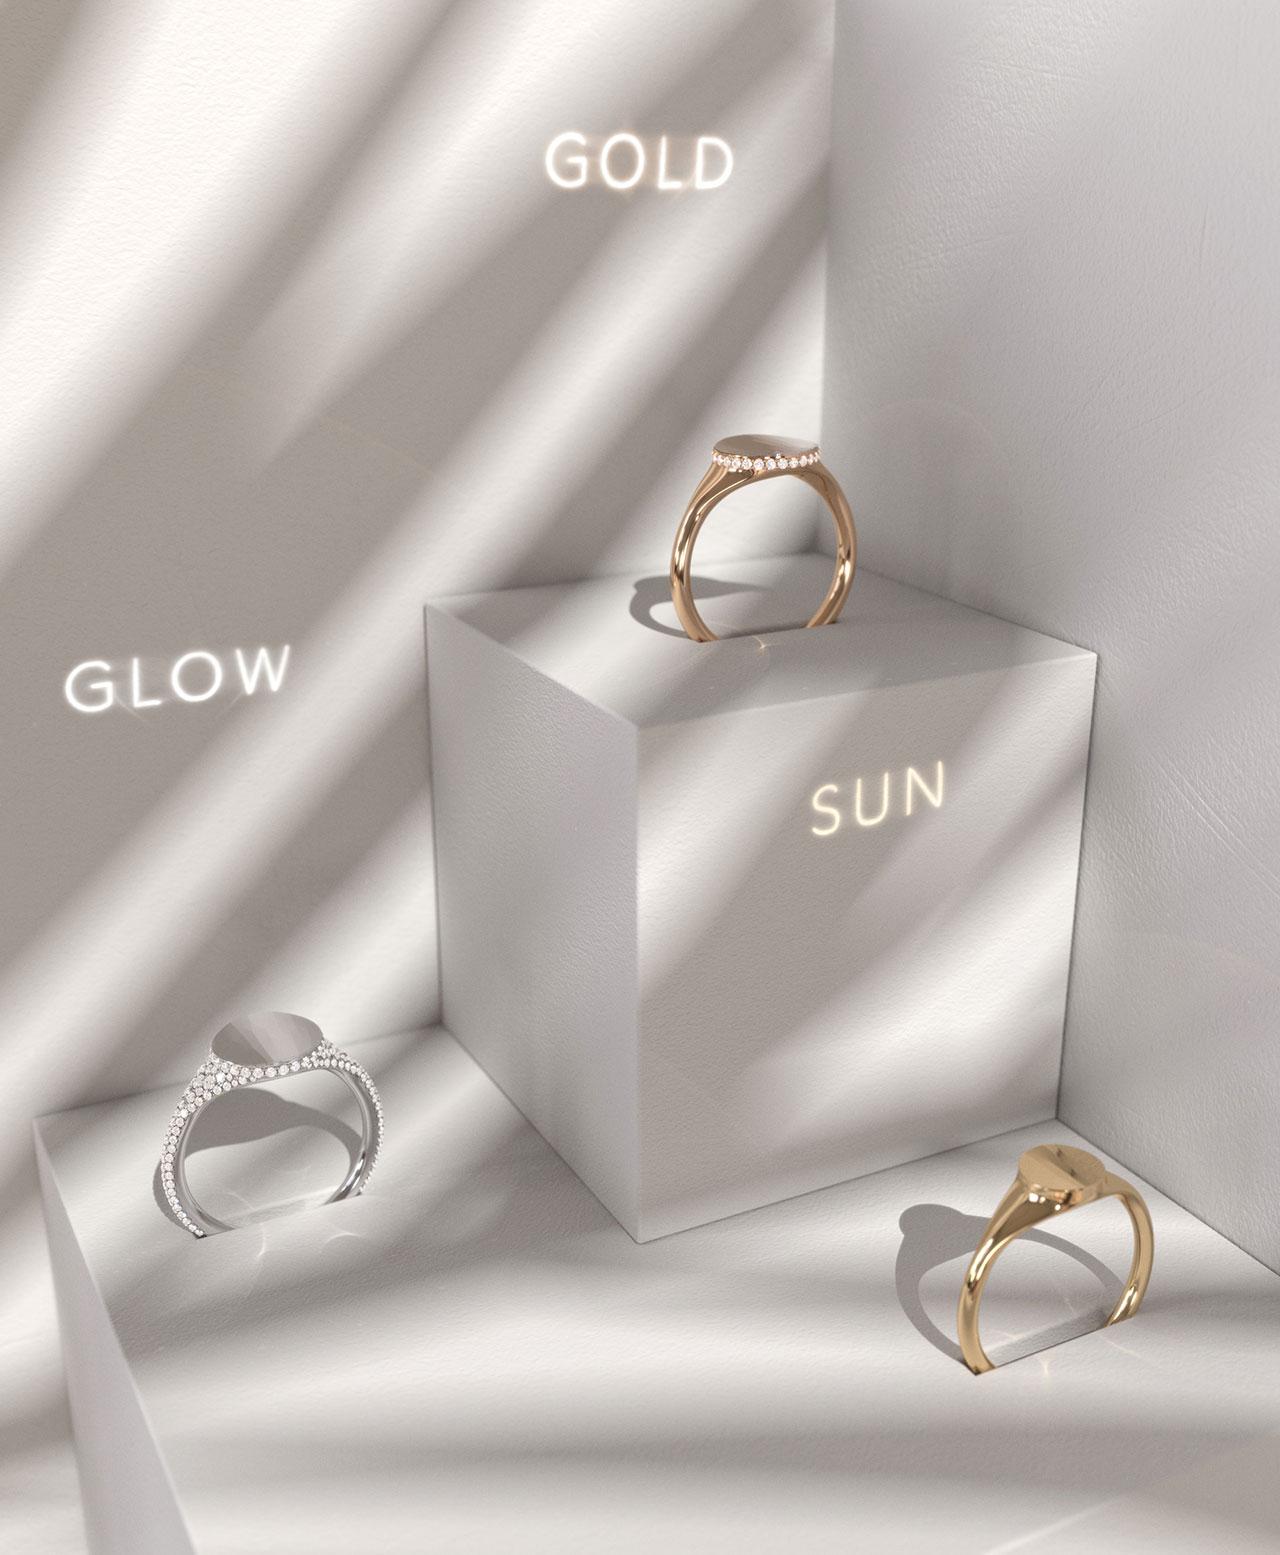 Dot Snow Ring GLOW, Dot Crown Ring GOLD & Dot Ring SUN © THE RAYY